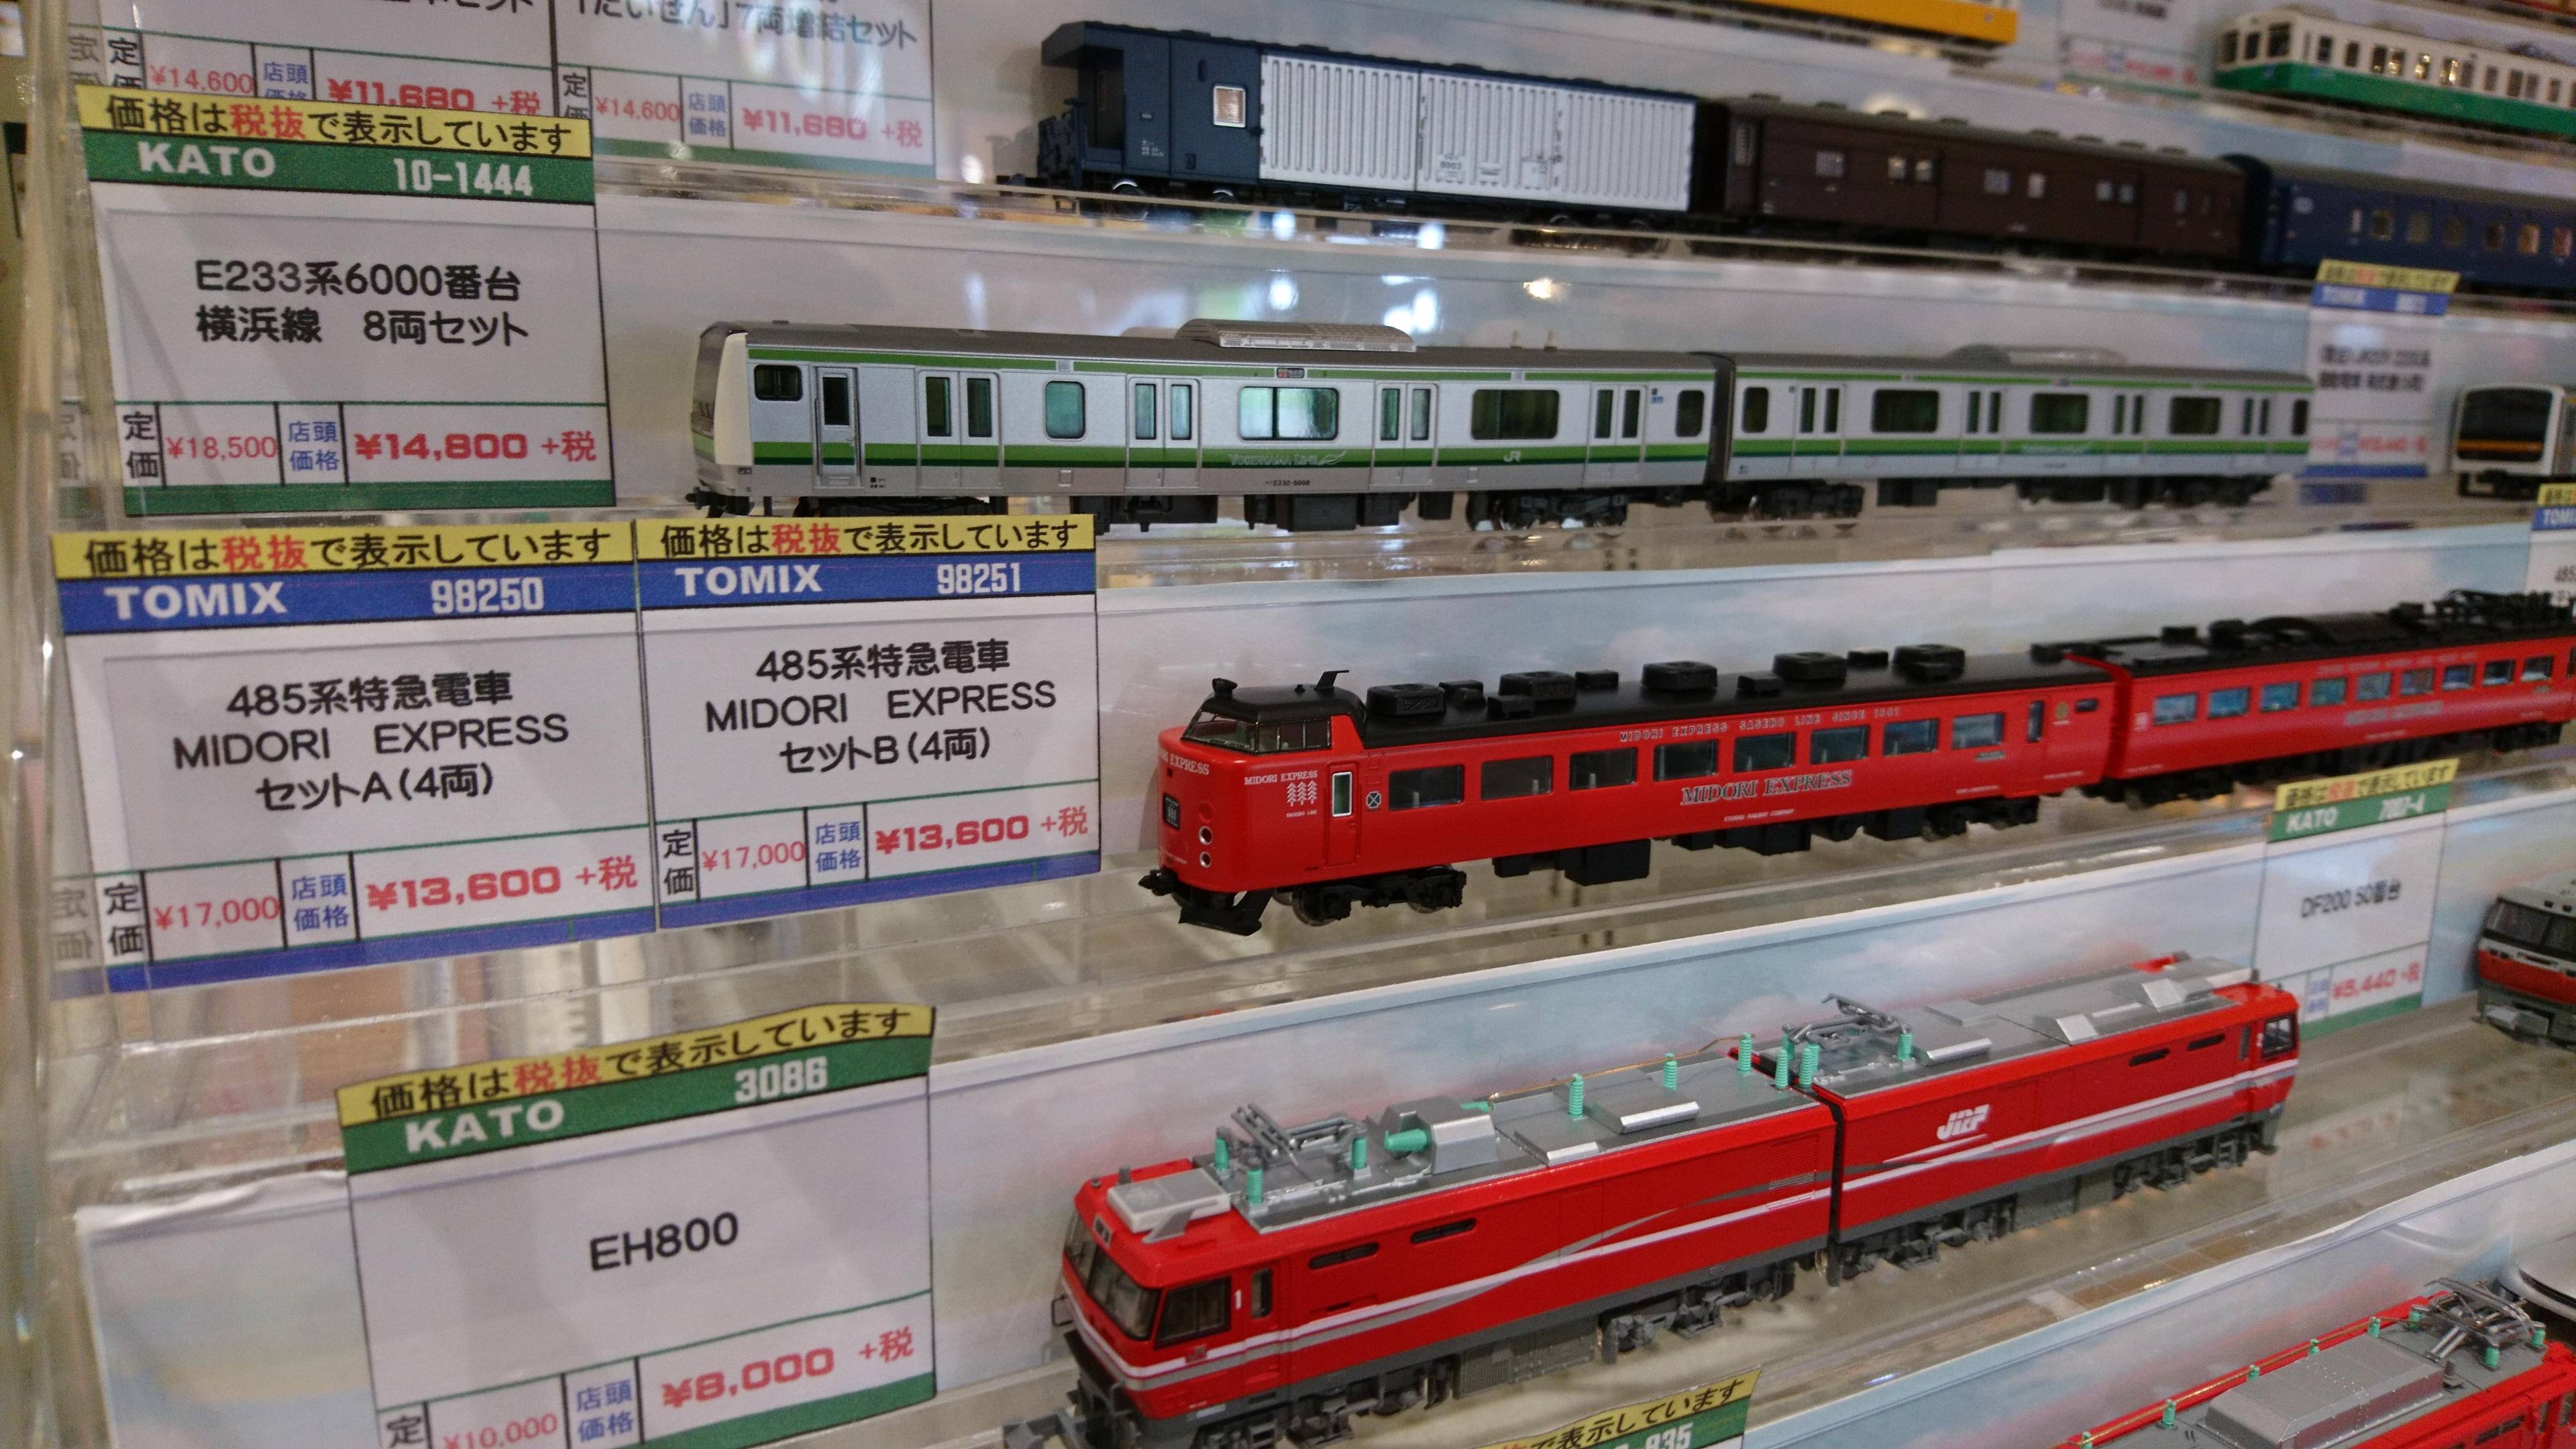 http://popondetta.com/blog_hiroshimafutyu/485midori.JPG